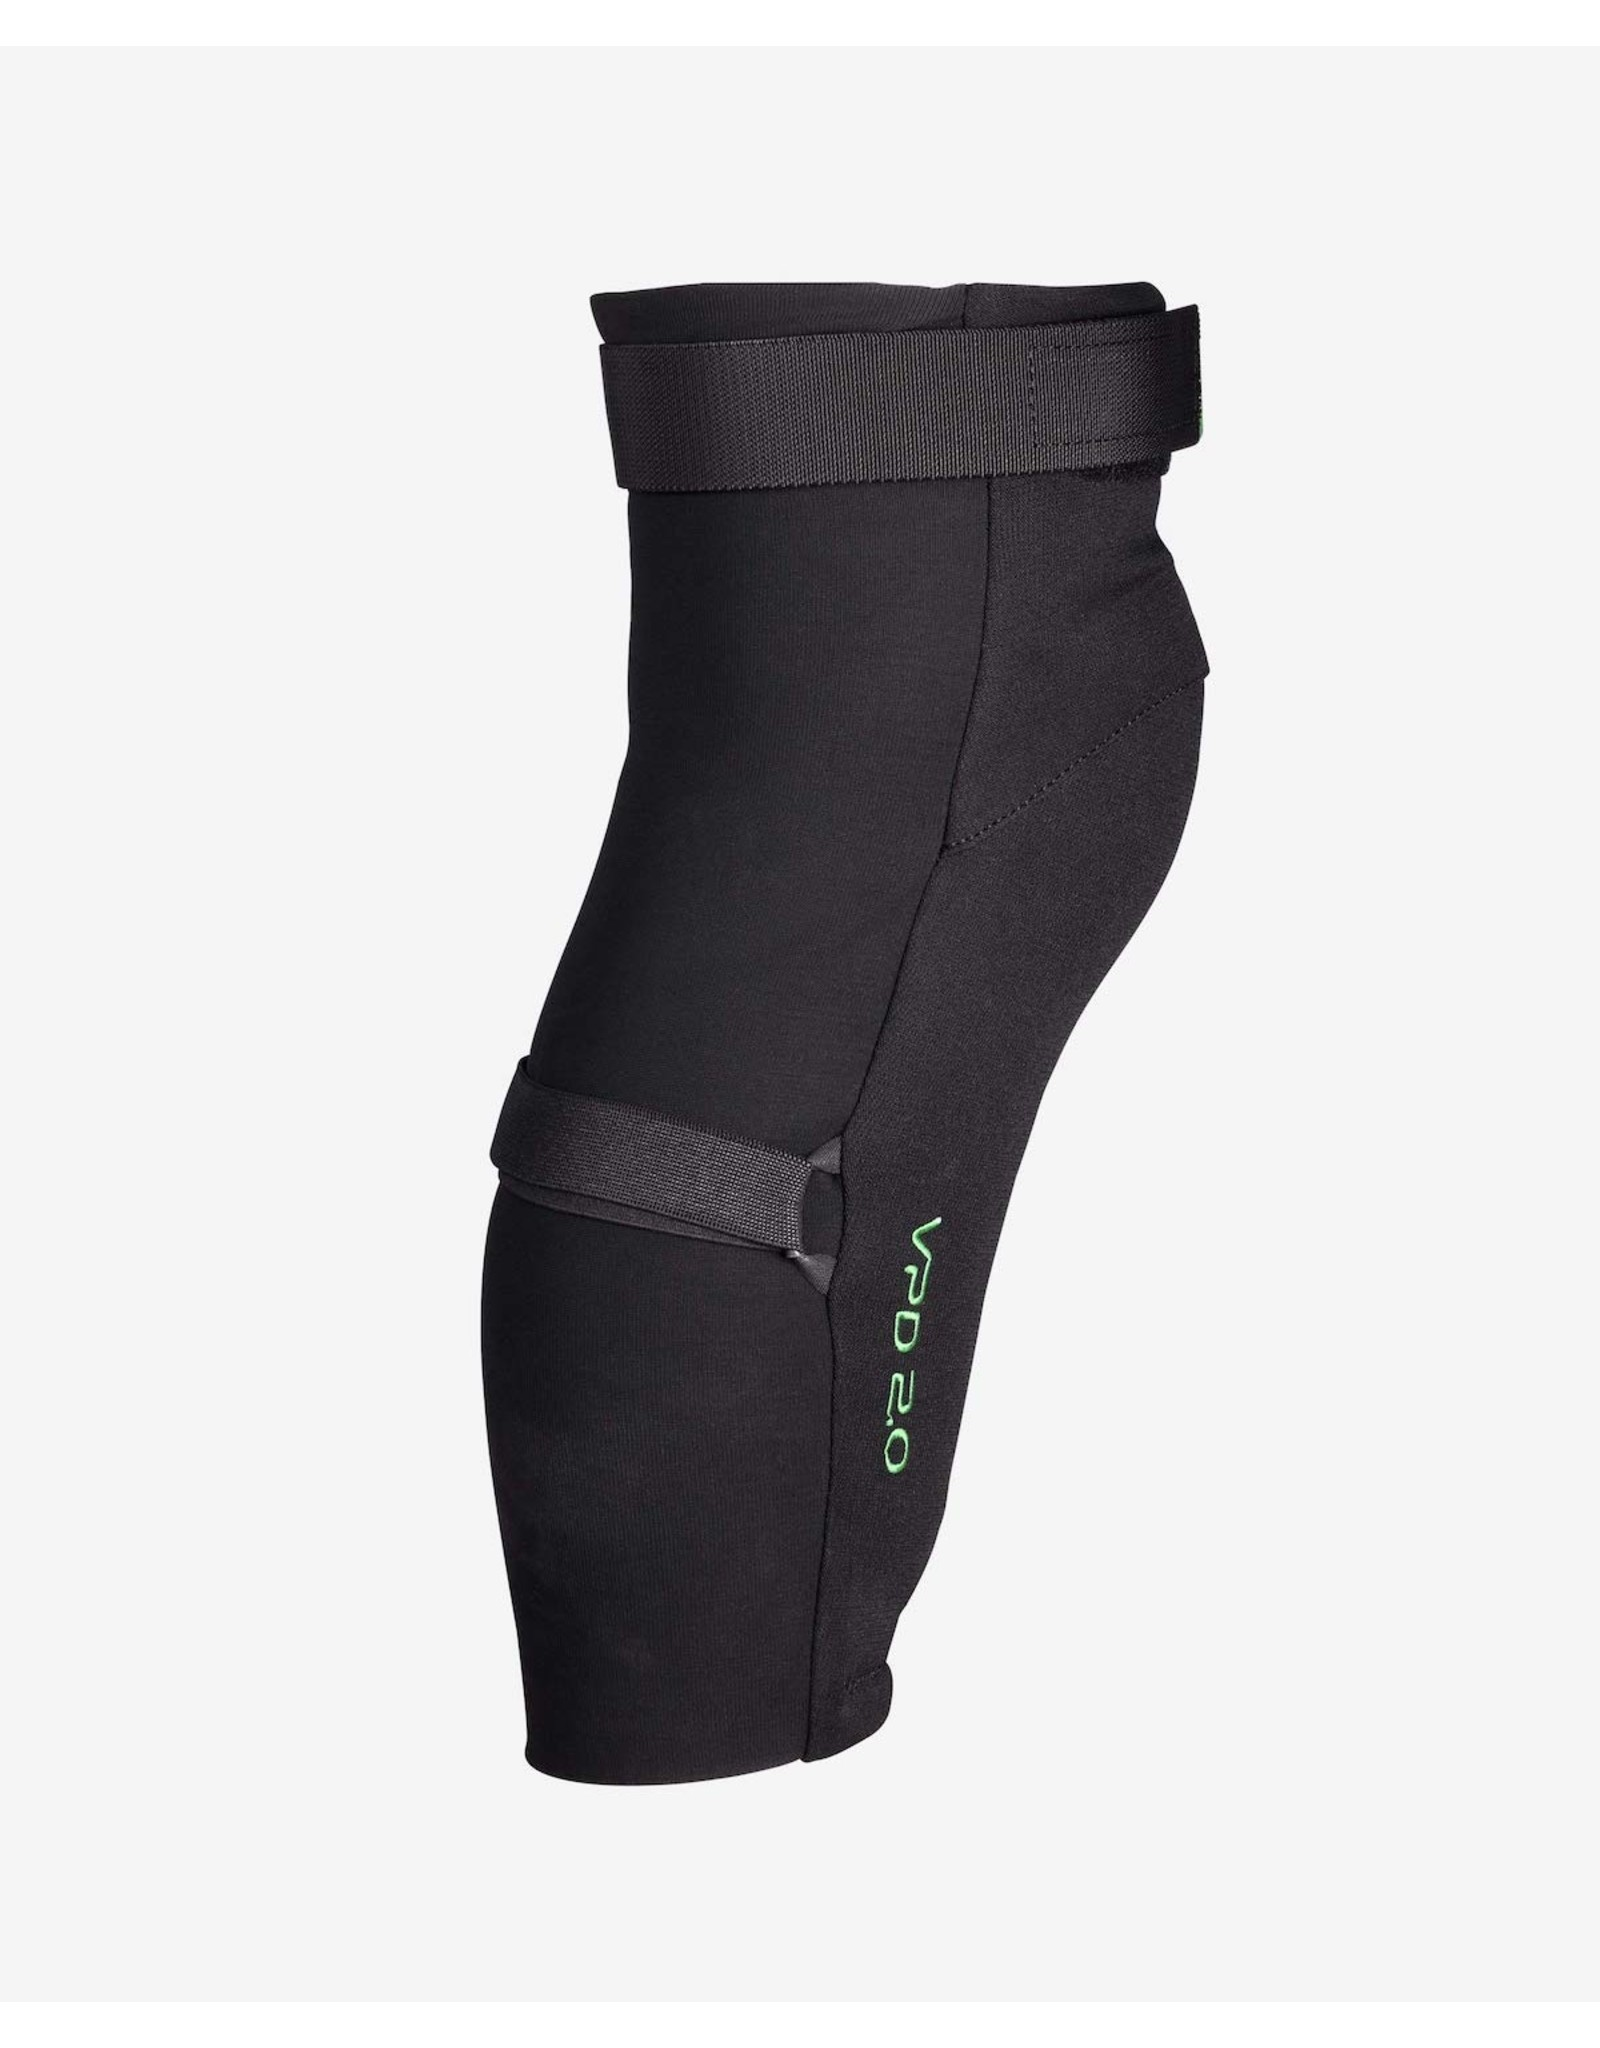 POC POC Joint VPD 2.0 Long Knee